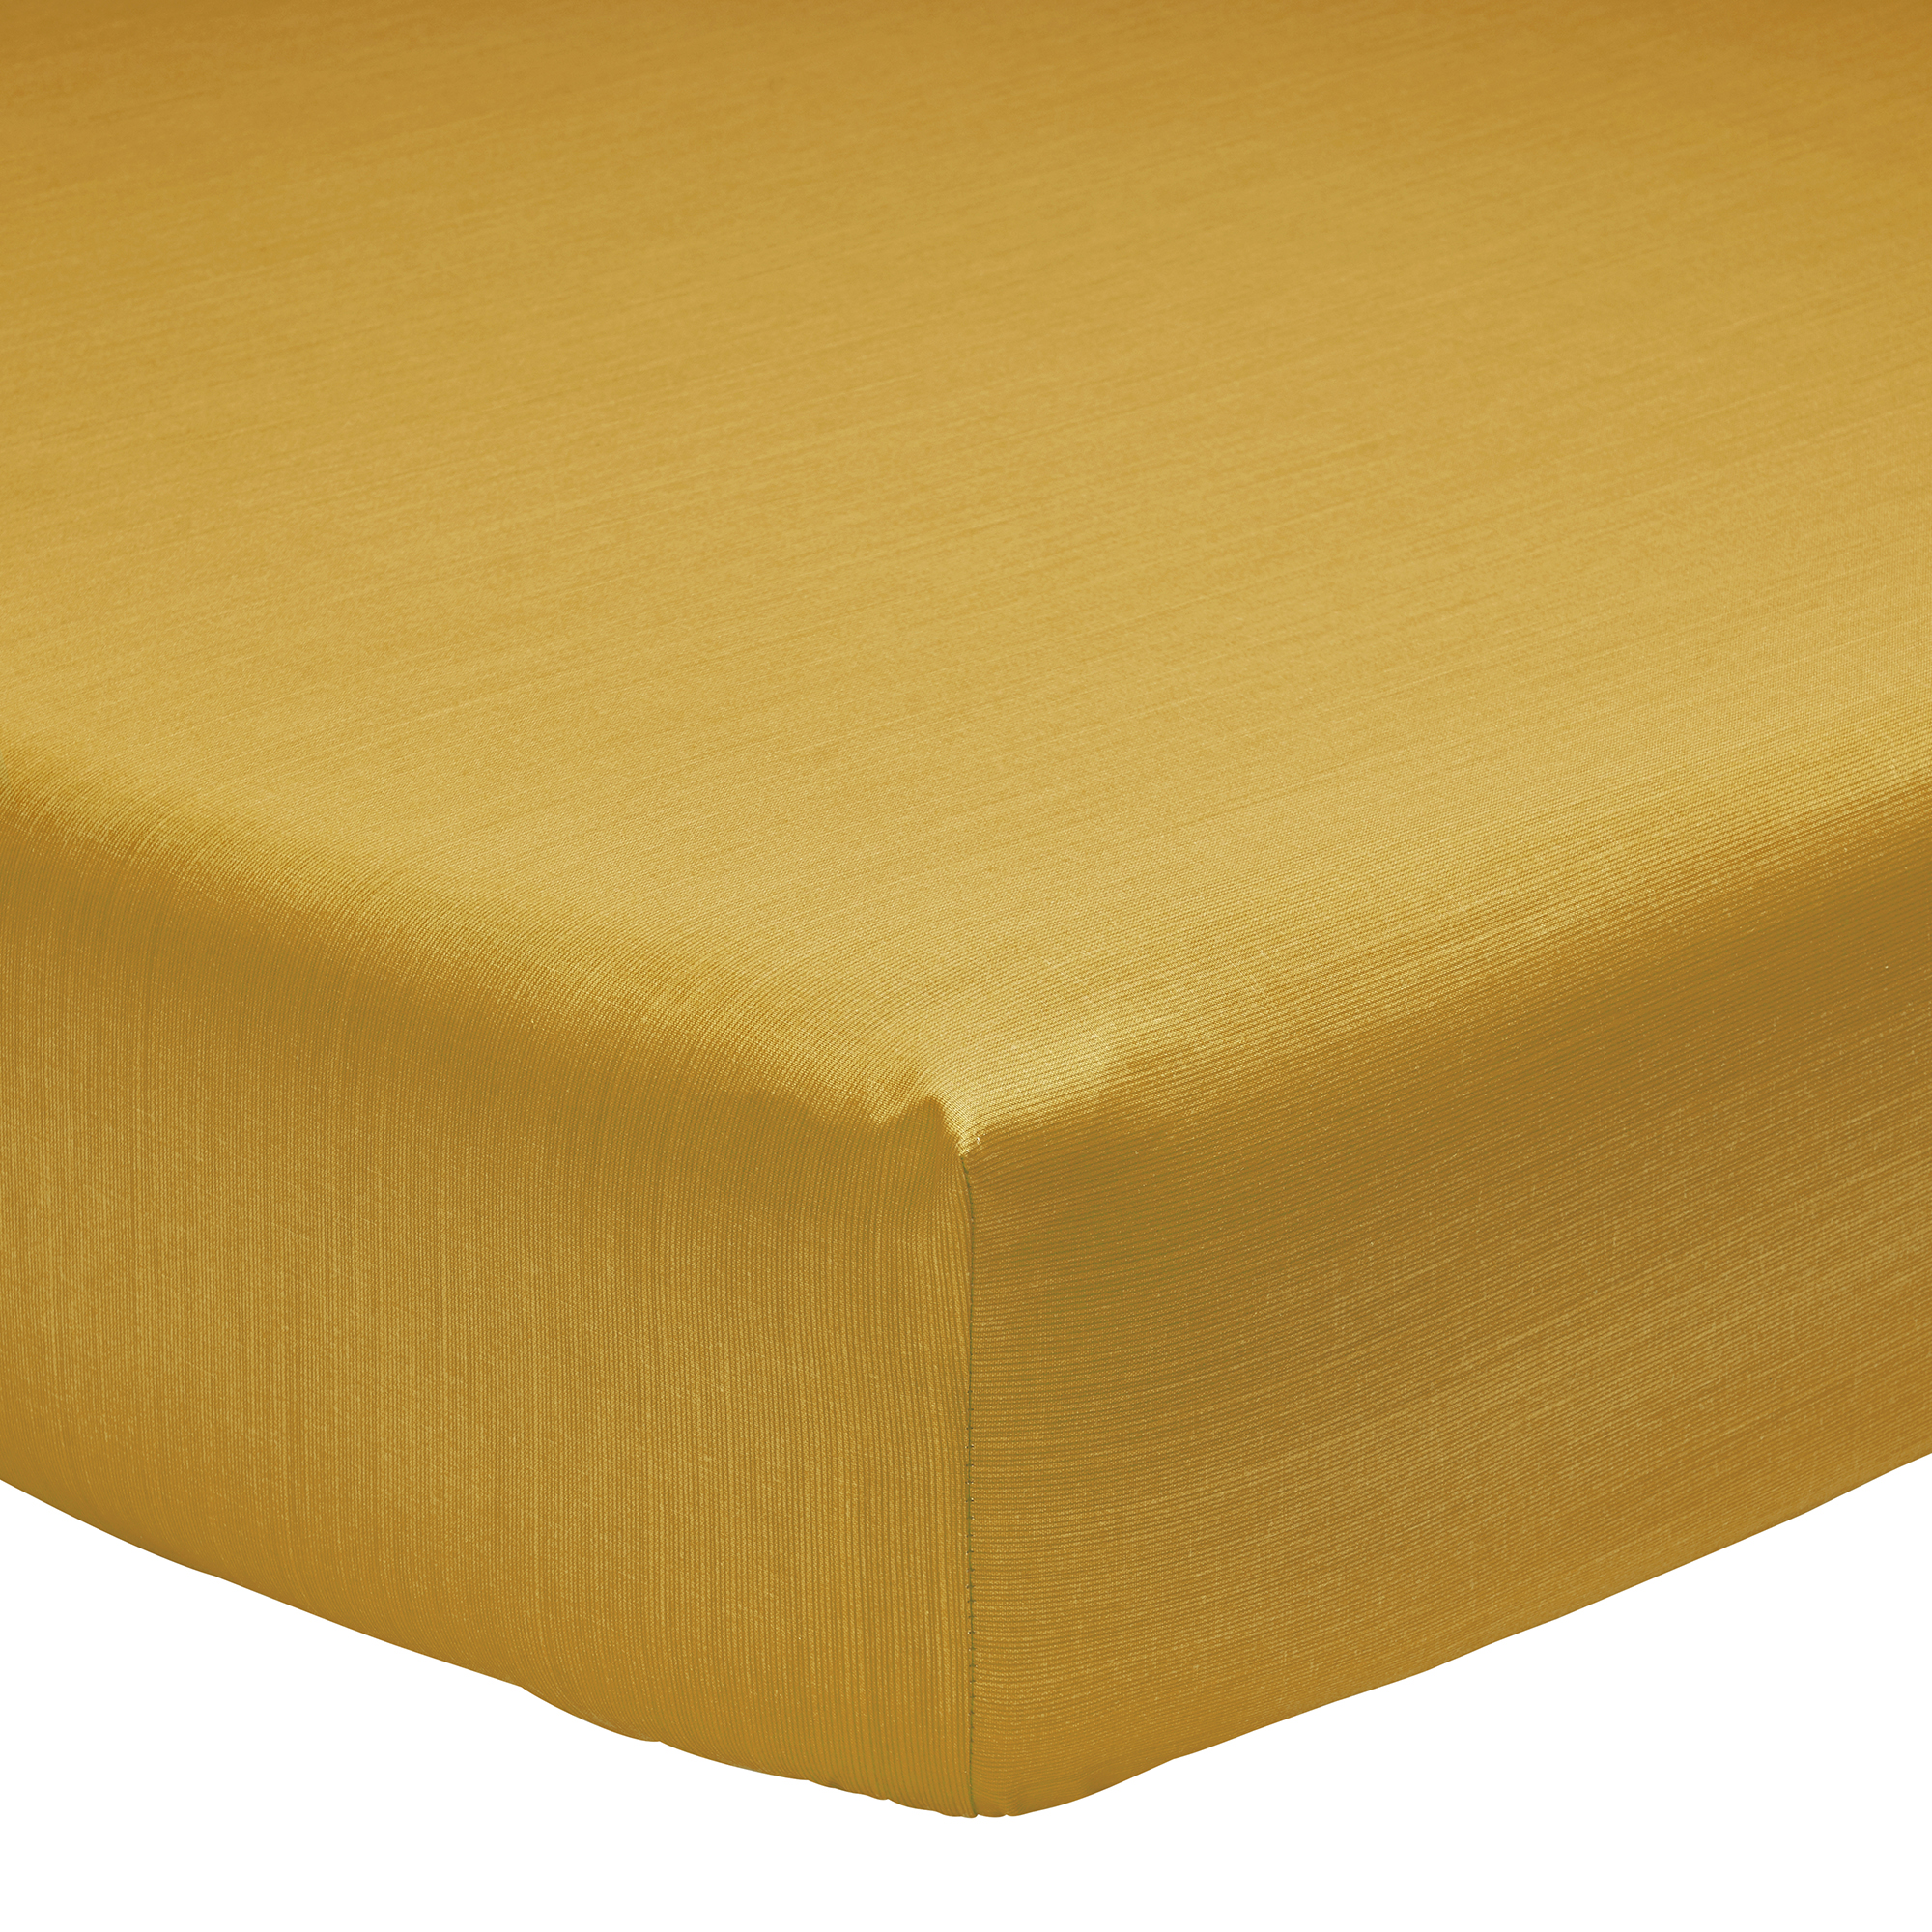 Drap housse fines rayures en bambou jaune 90 x 190